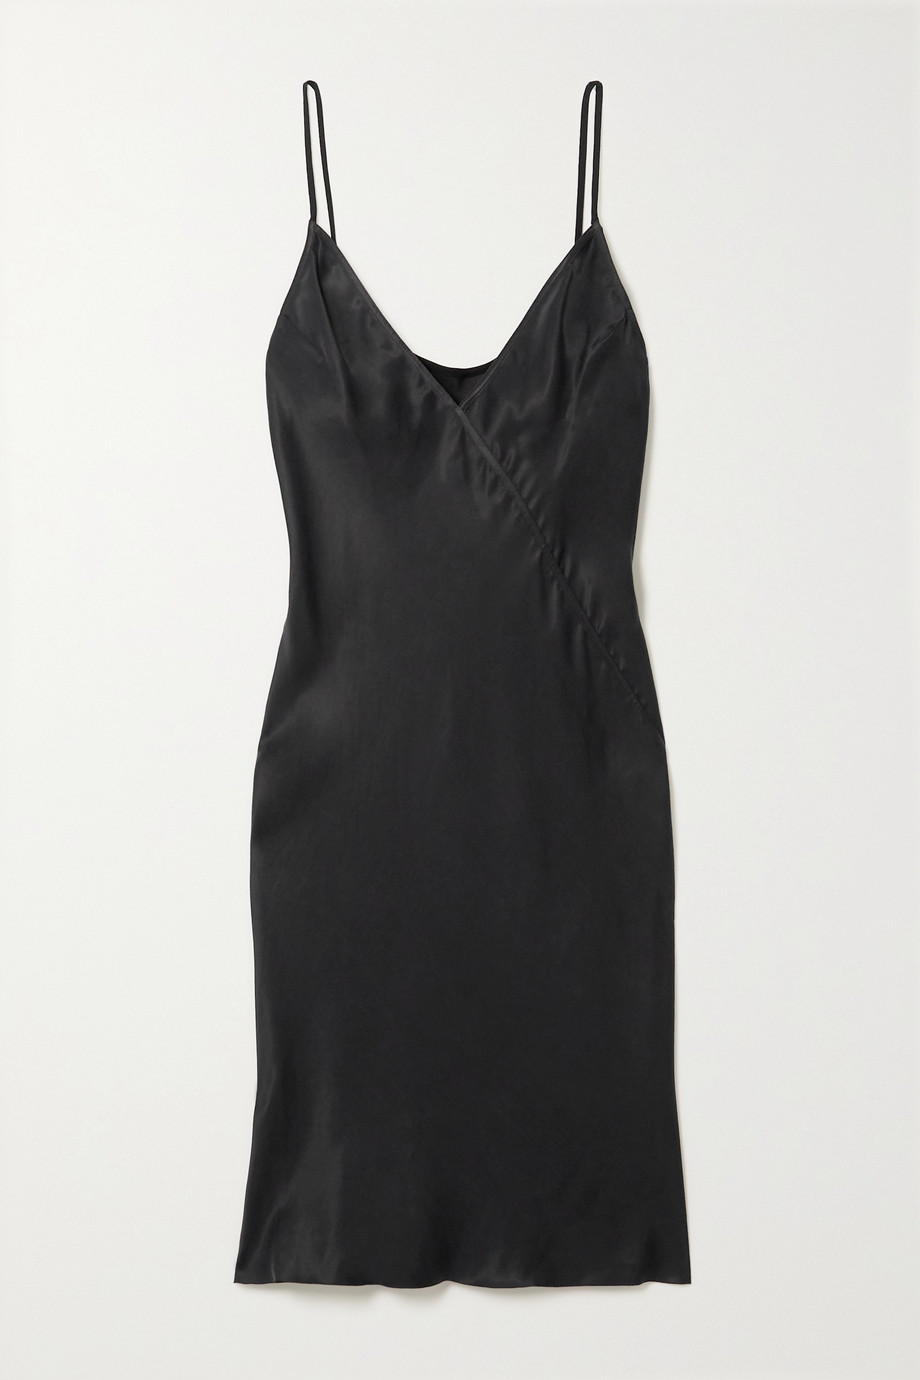 Rick Owens Pandora paneled cupro mini dress